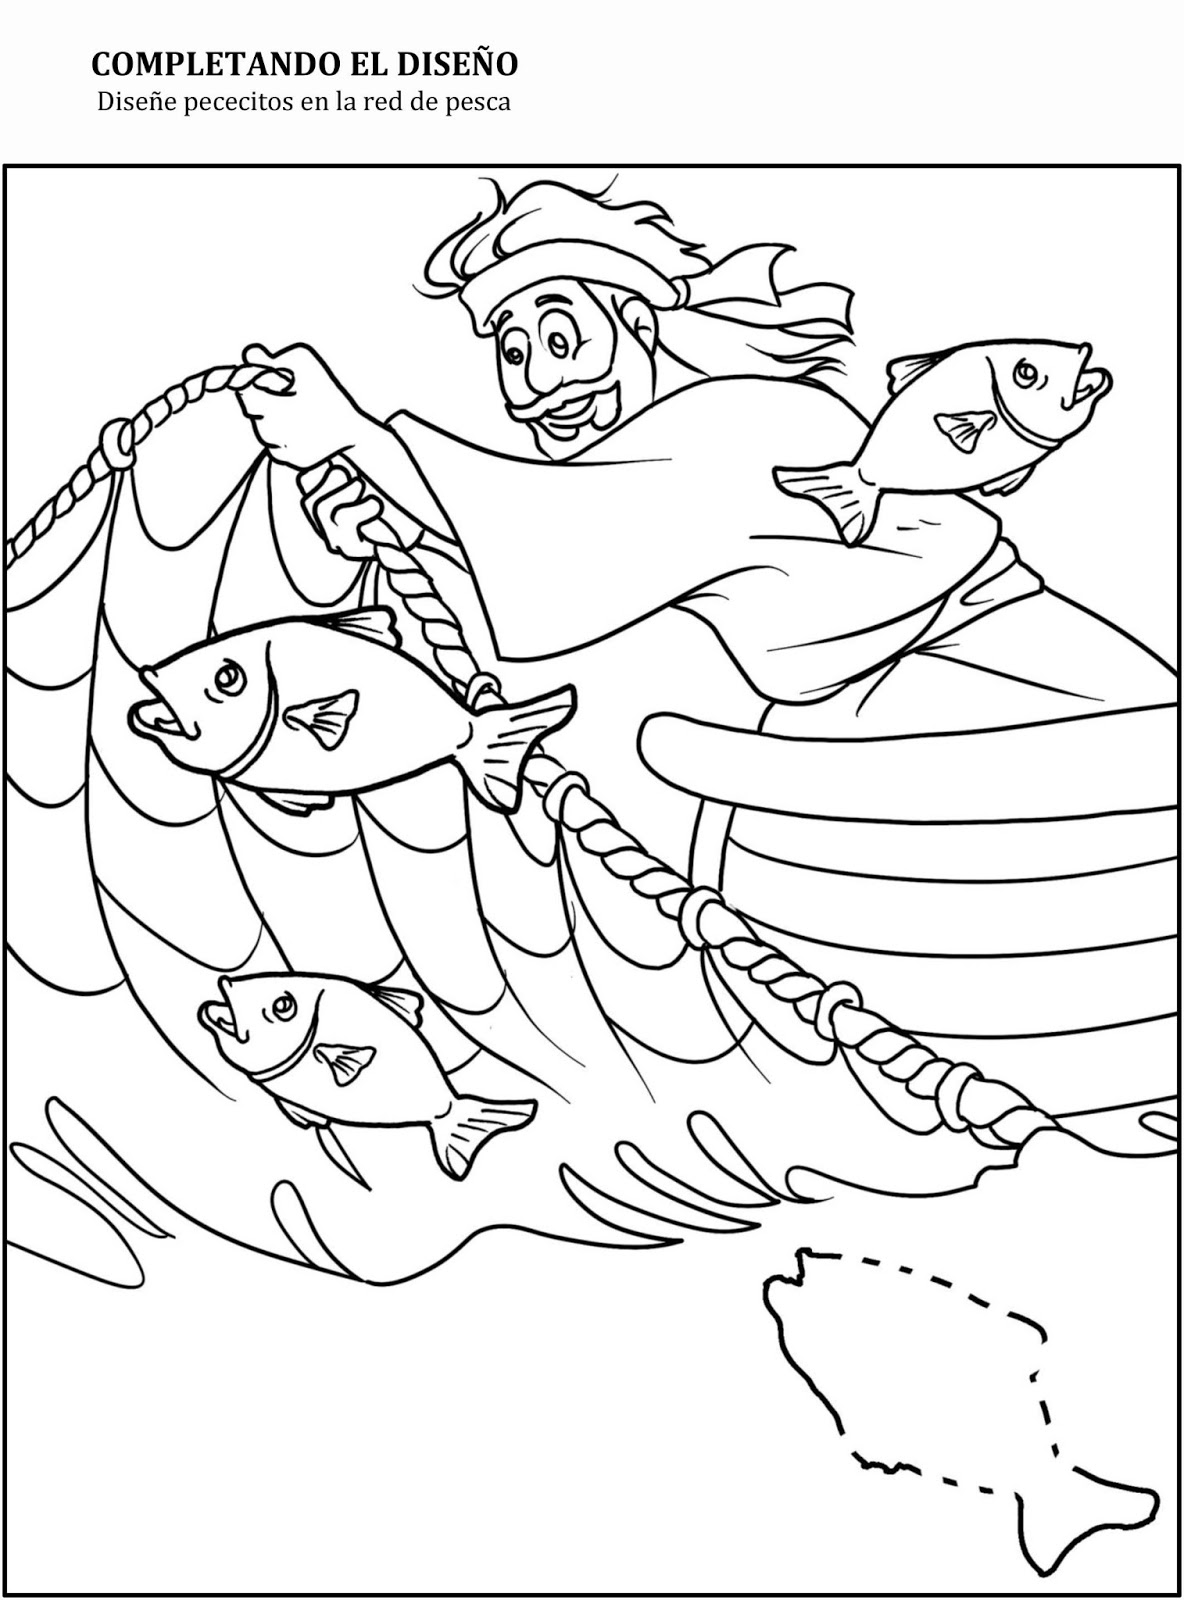 Dibujo Para Colorear Hombre Pescando picture gallery